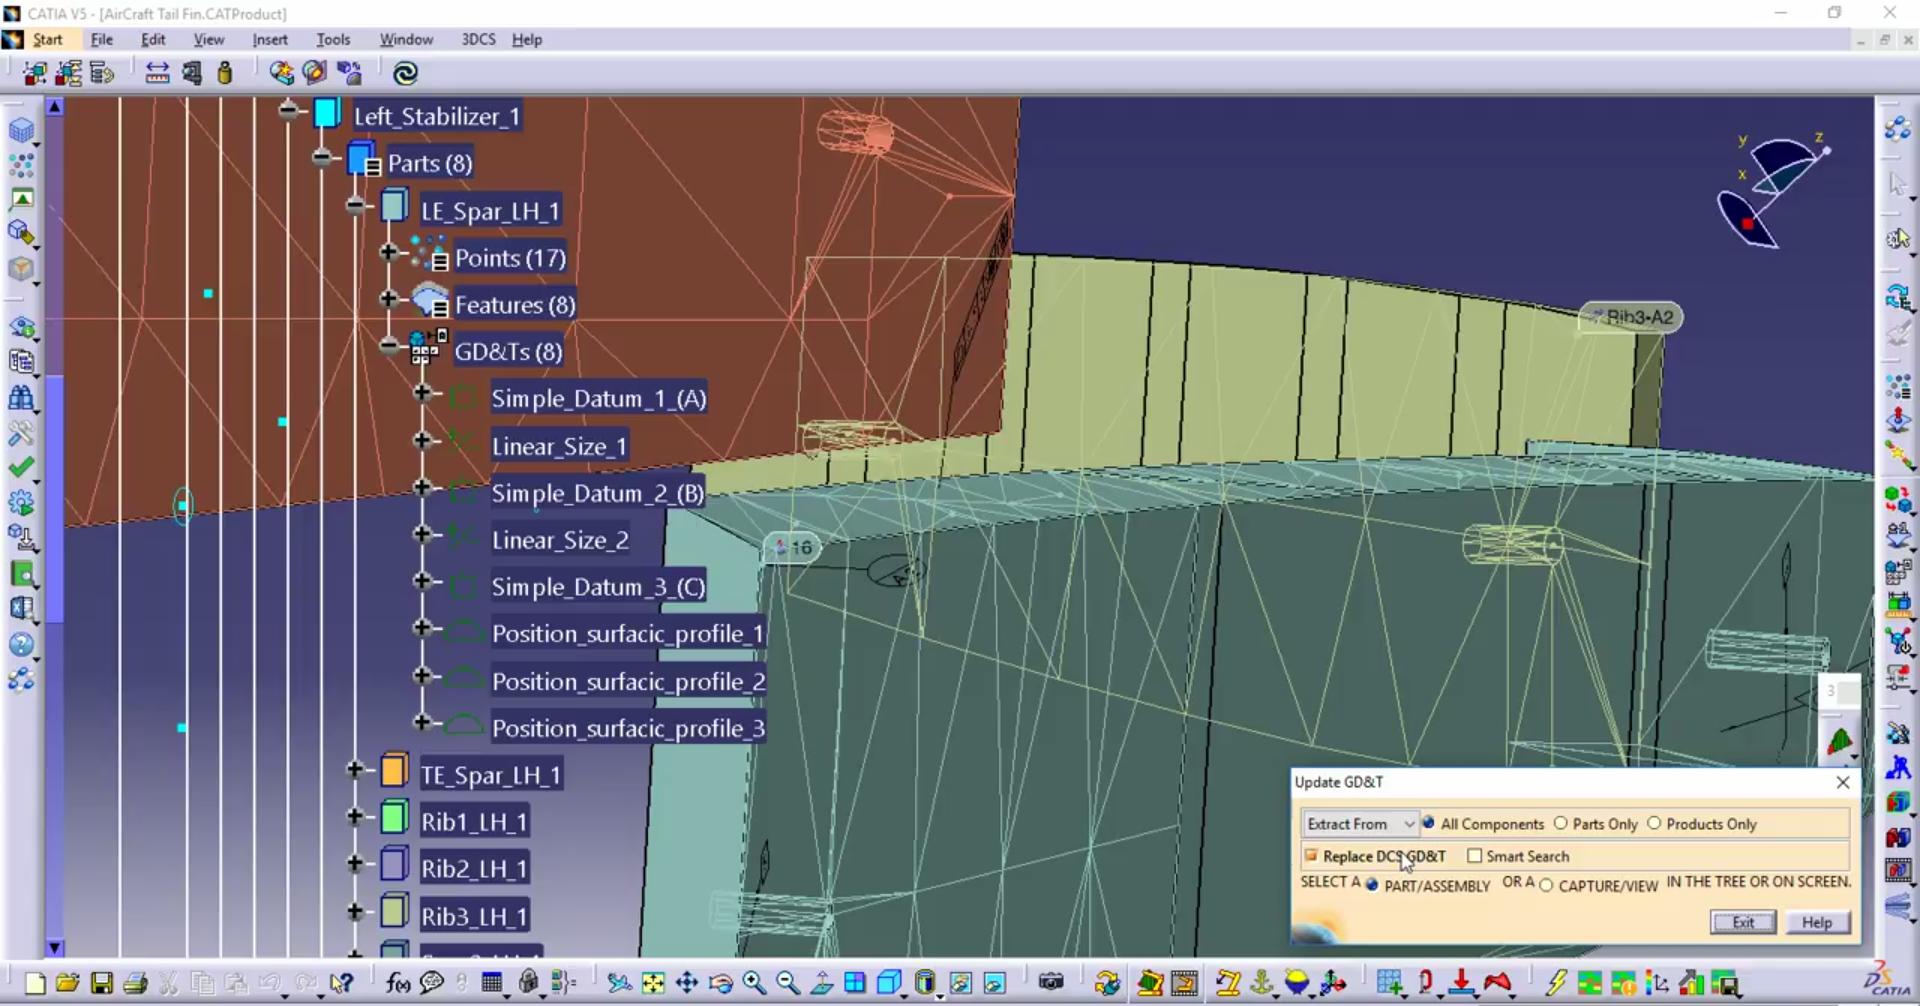 3dcs-efficiency-workshop-embedded-gdandt-fta-catia.png